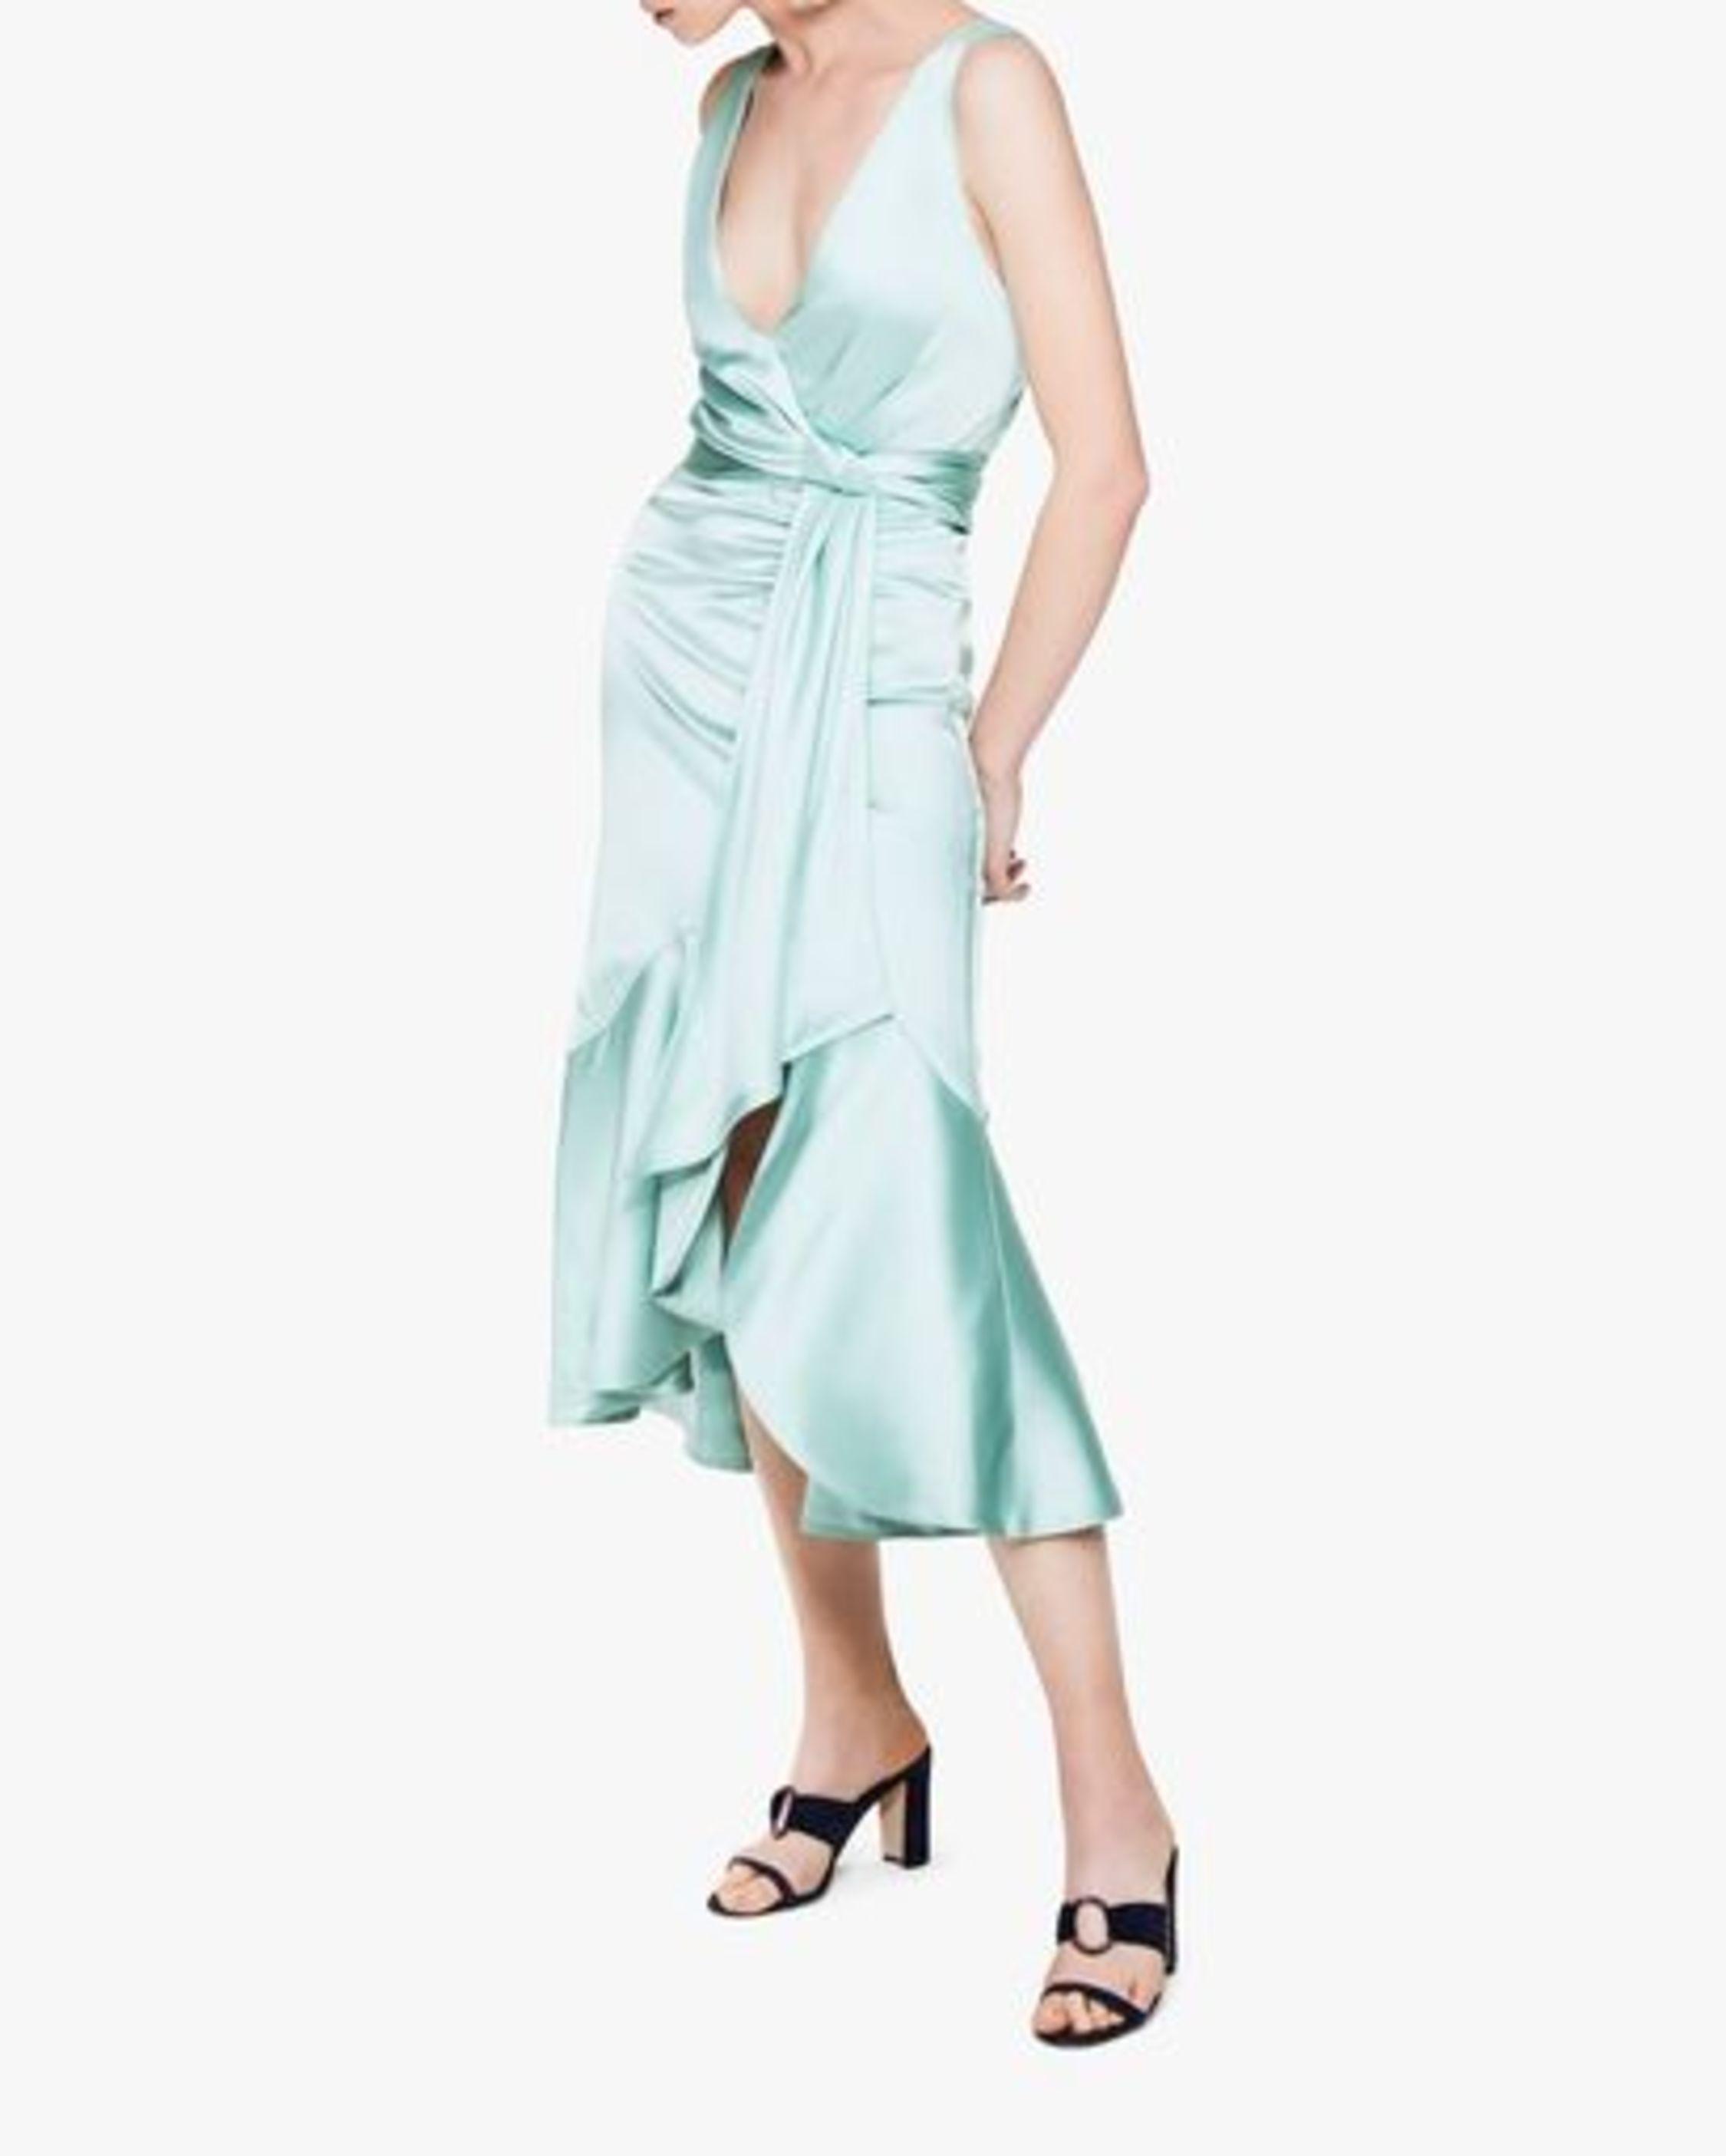 Jonathan Simkhai Mia Fluid Satin Maxi Dress 2